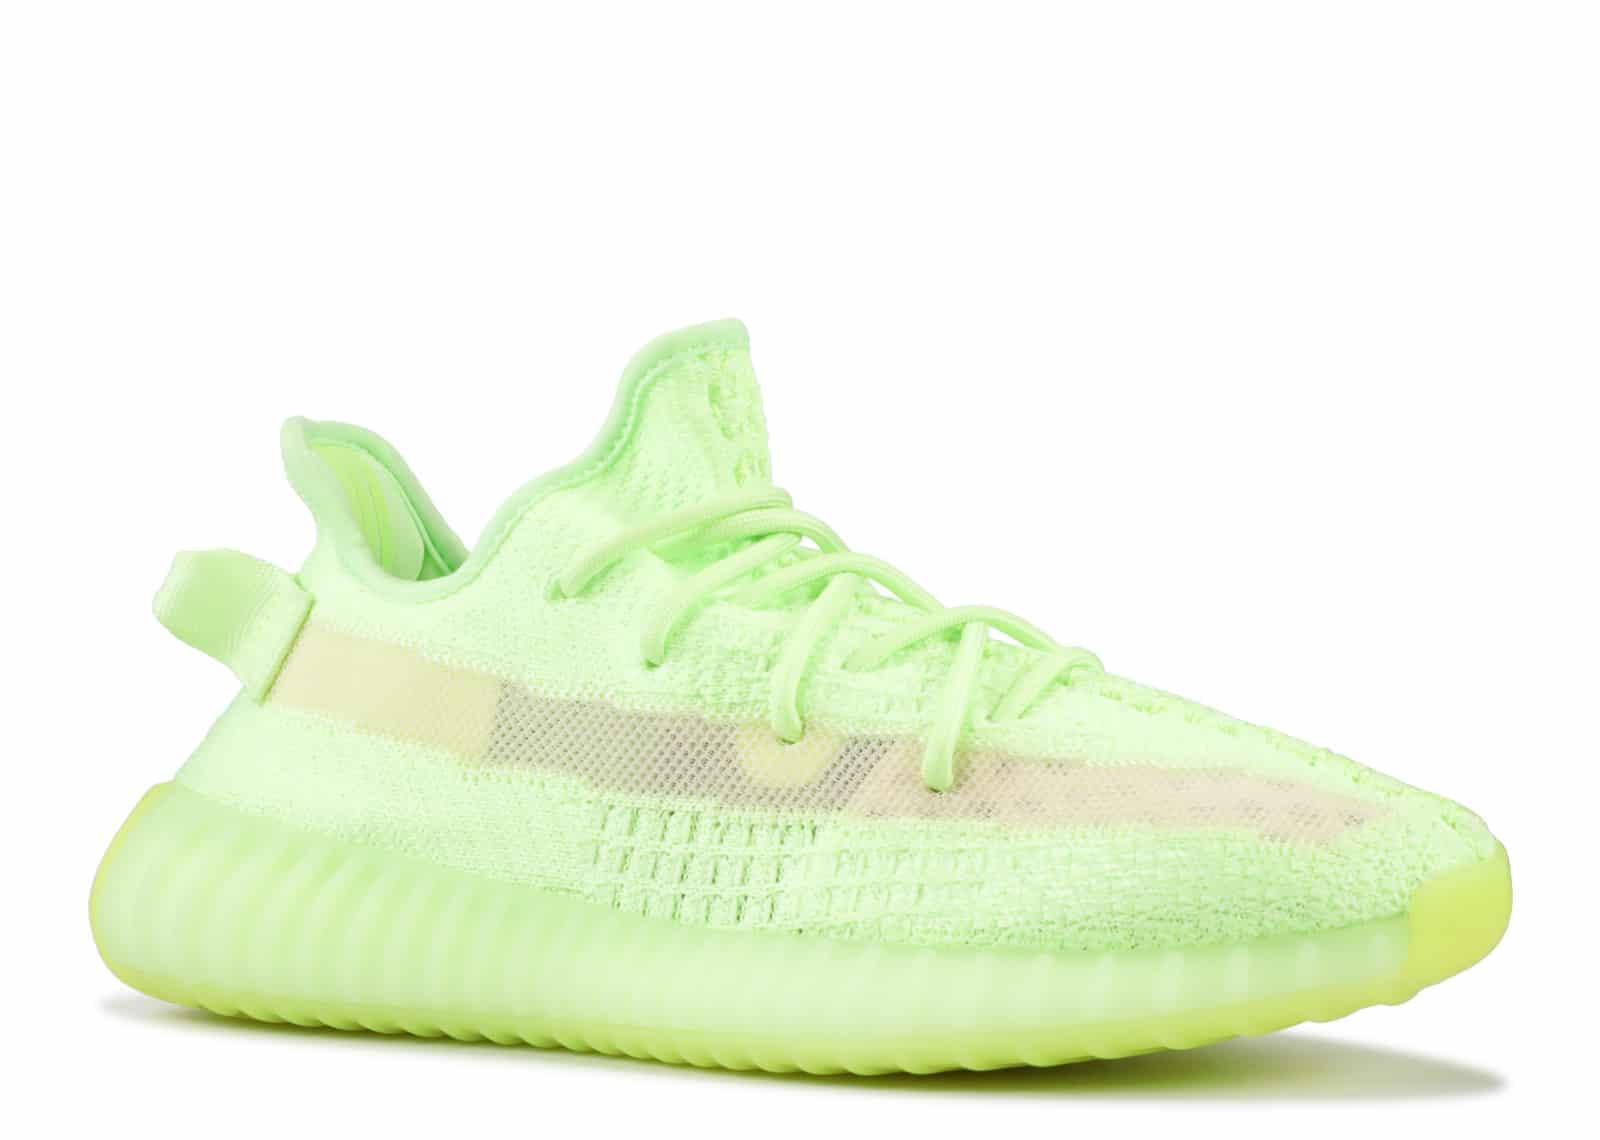 Adidas Yeezy Boost 350 V2 Glow  im Angebot